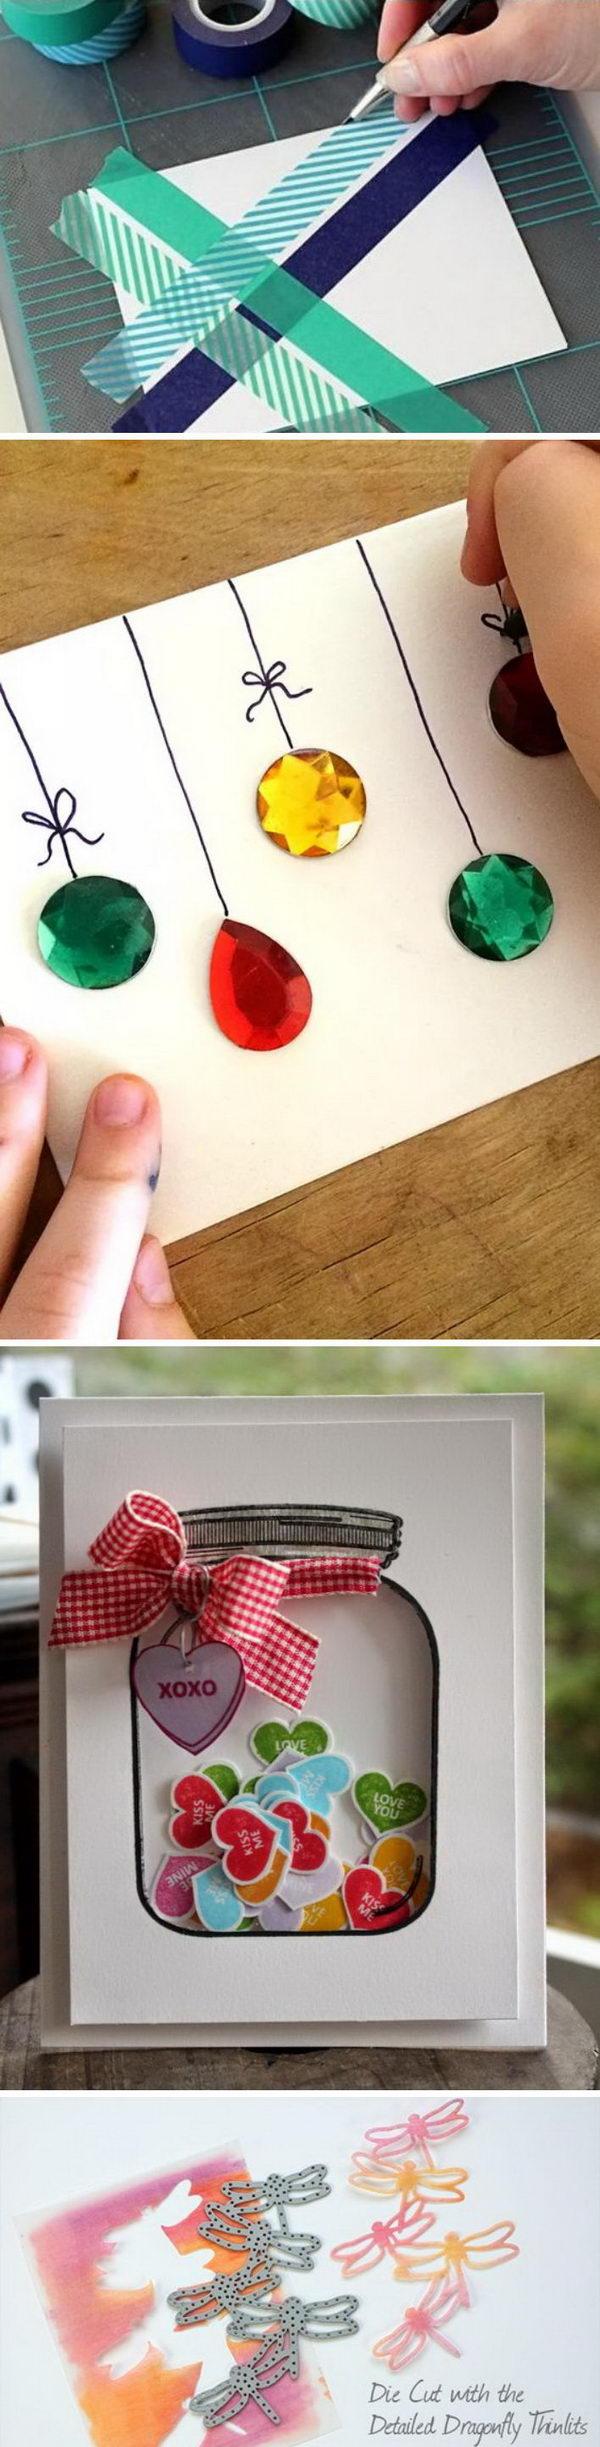 Handmade Card Ideas and Tutorials.